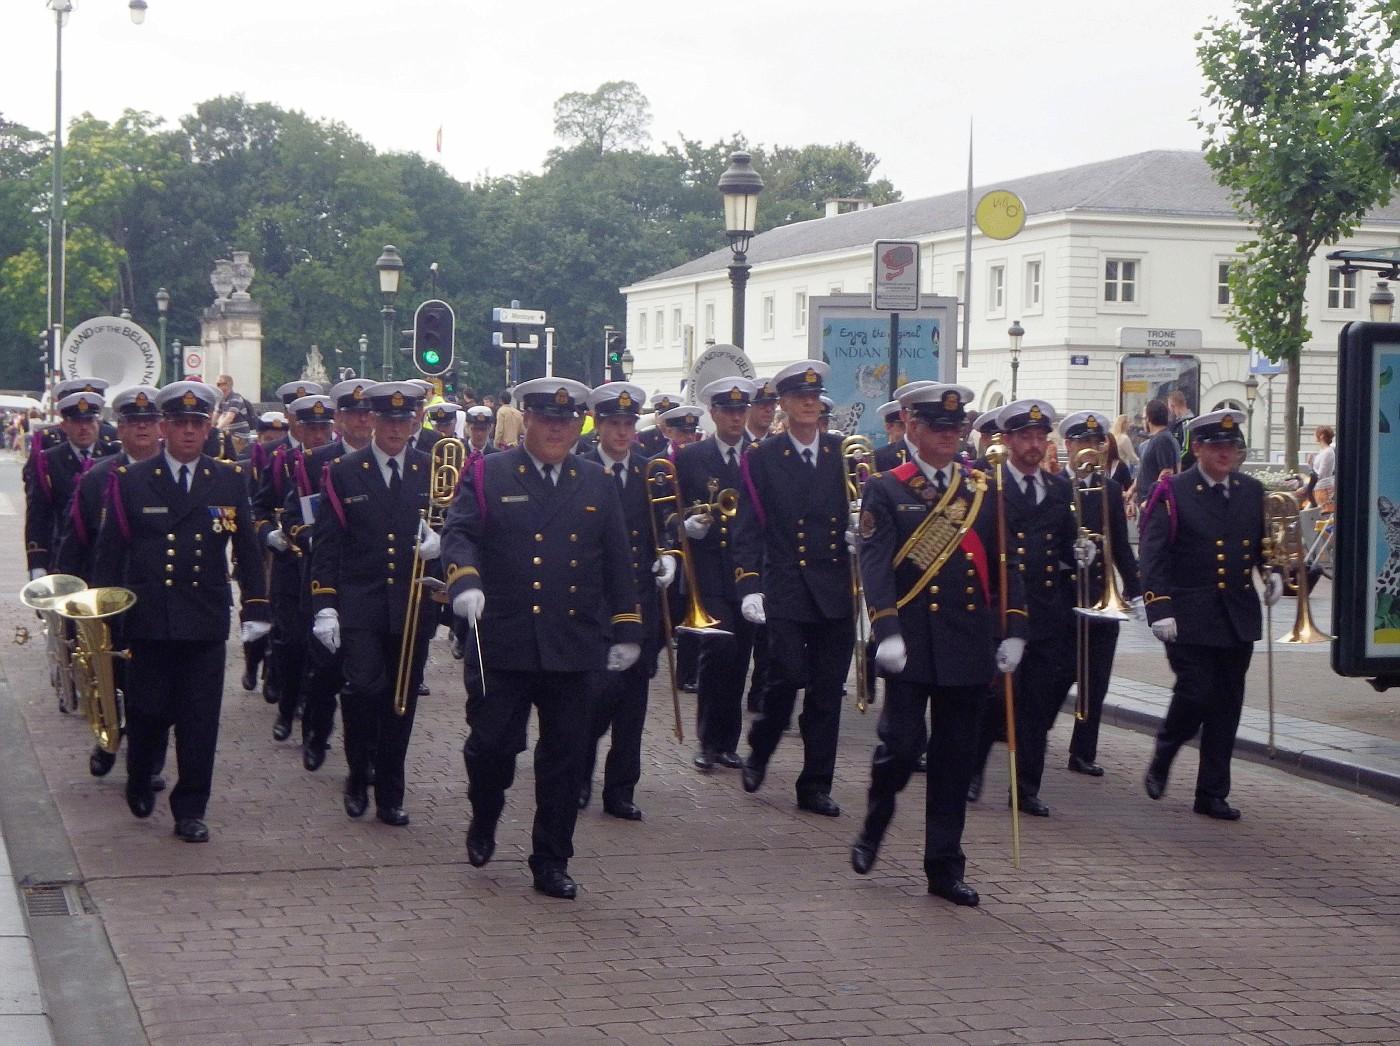 Marschmusik, Place Royale